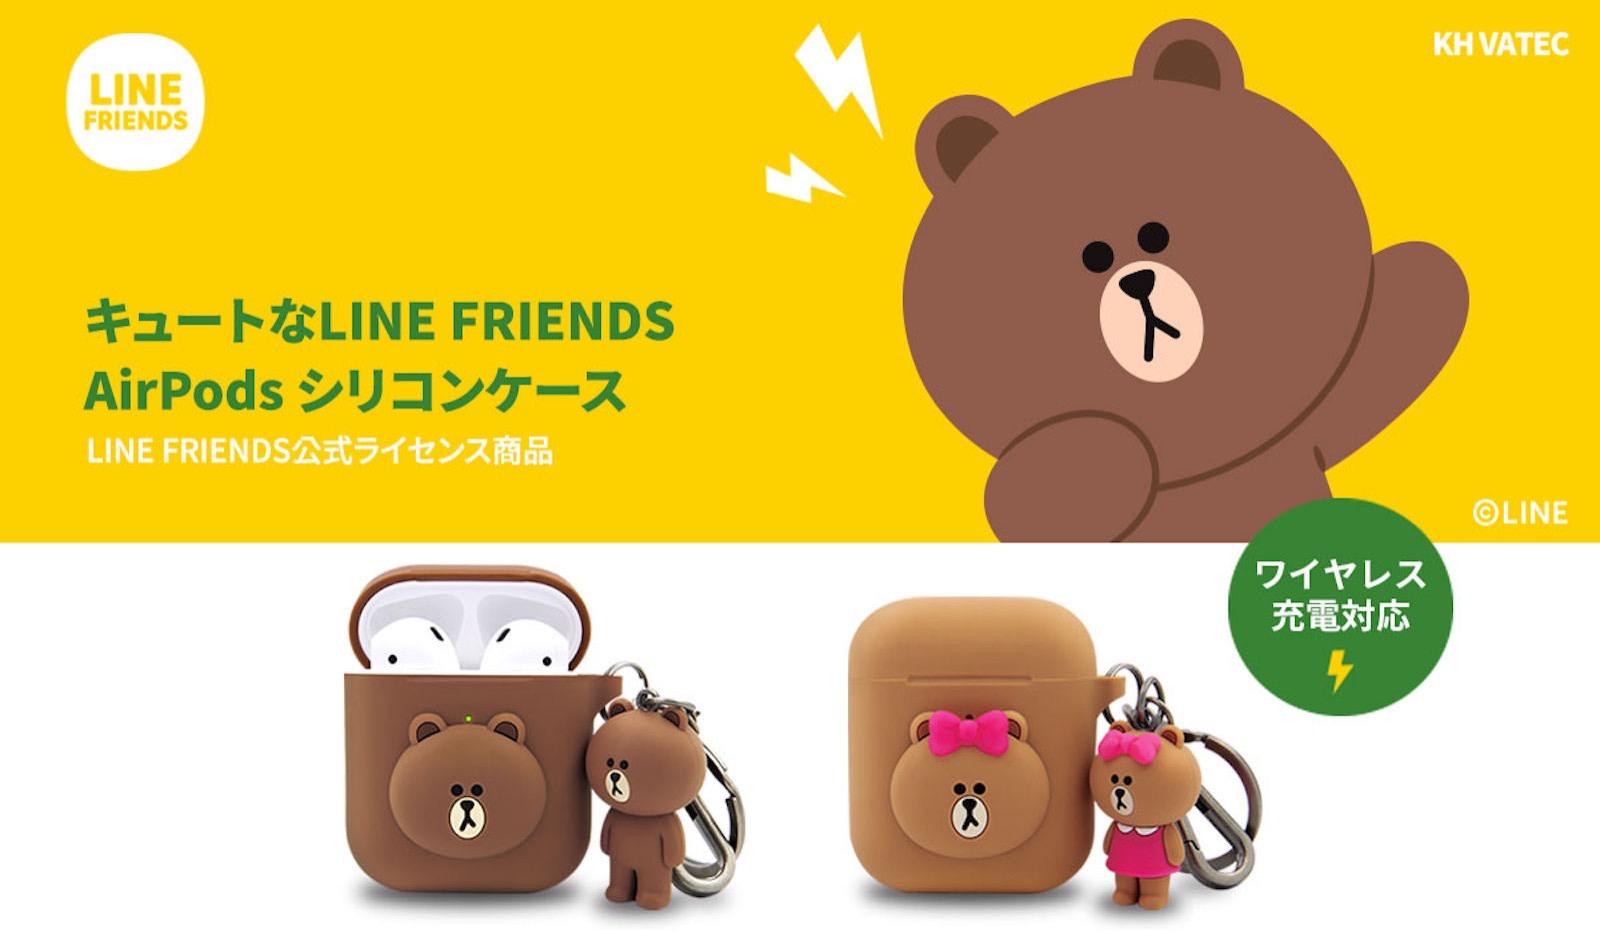 LINE-Friends-AirPods-Case-1.jpg